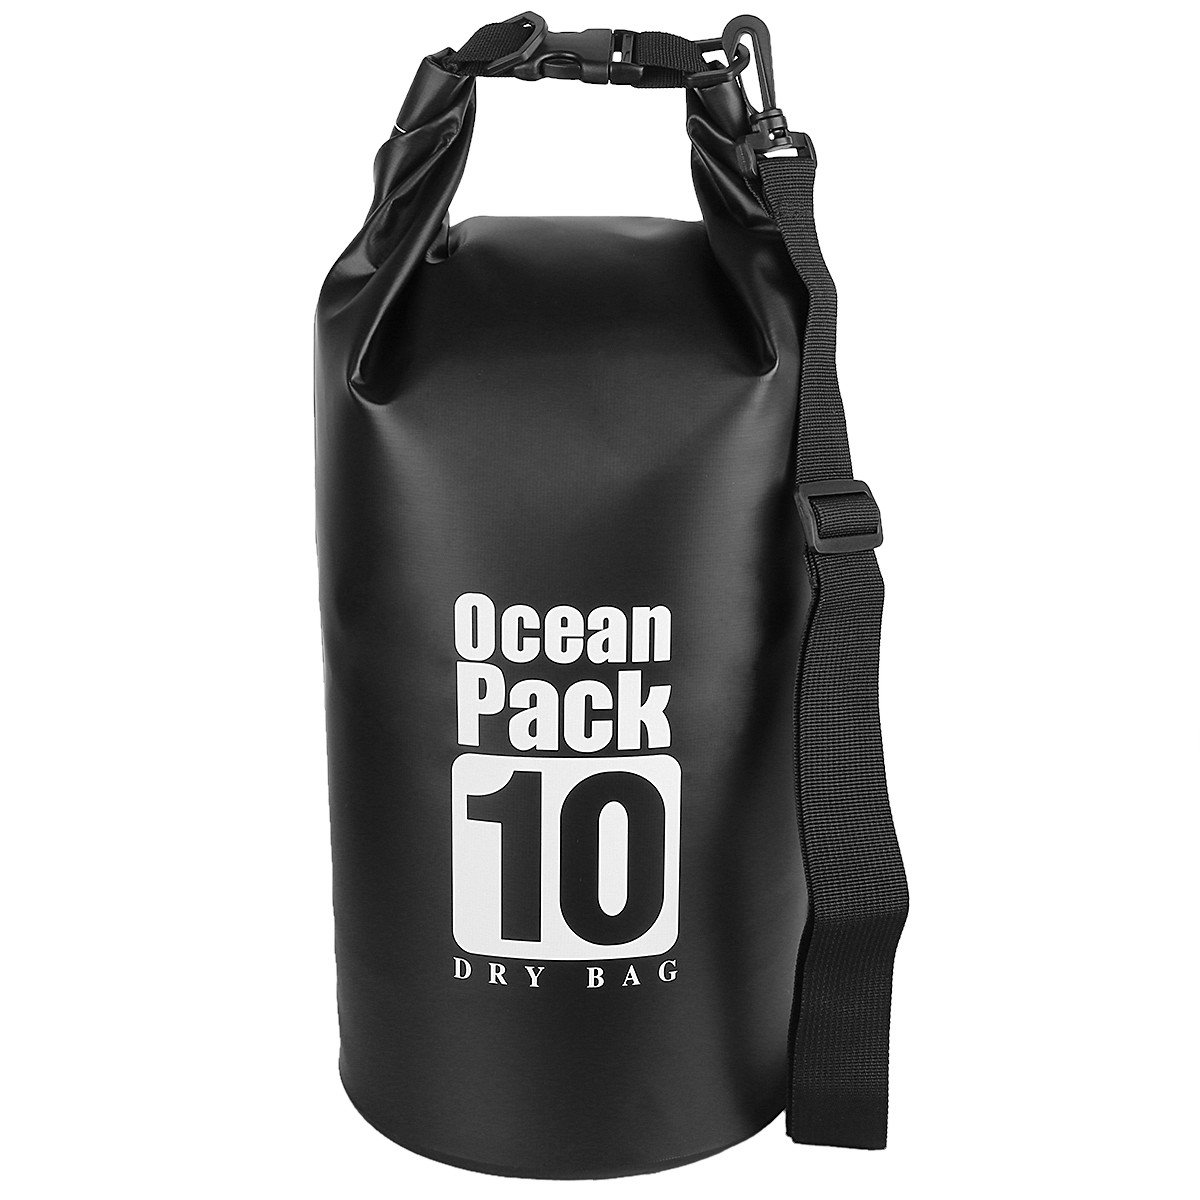 sportmusies 10l / 20l / 30l水ドライバッグ袋、頑丈PVC防水ギアバッグforカヤックボートカヌー B07BVK9WPM Black/10 Liters  Black/10 Liters